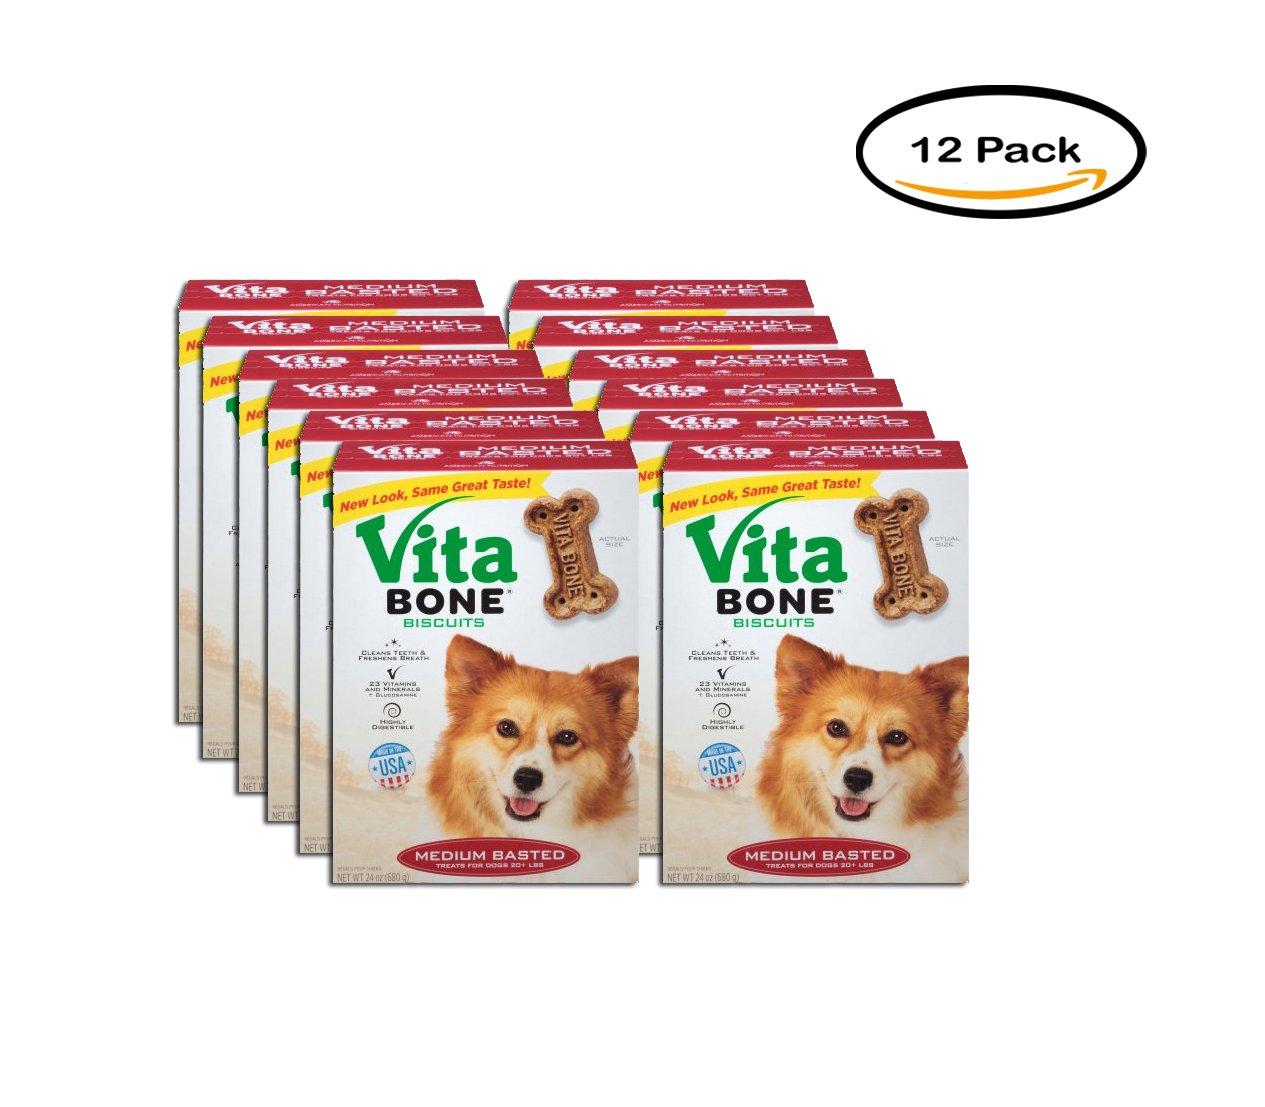 PACK OF 12 - Vita Bone Medium Basted Dog Biscuits 24 oz. Box